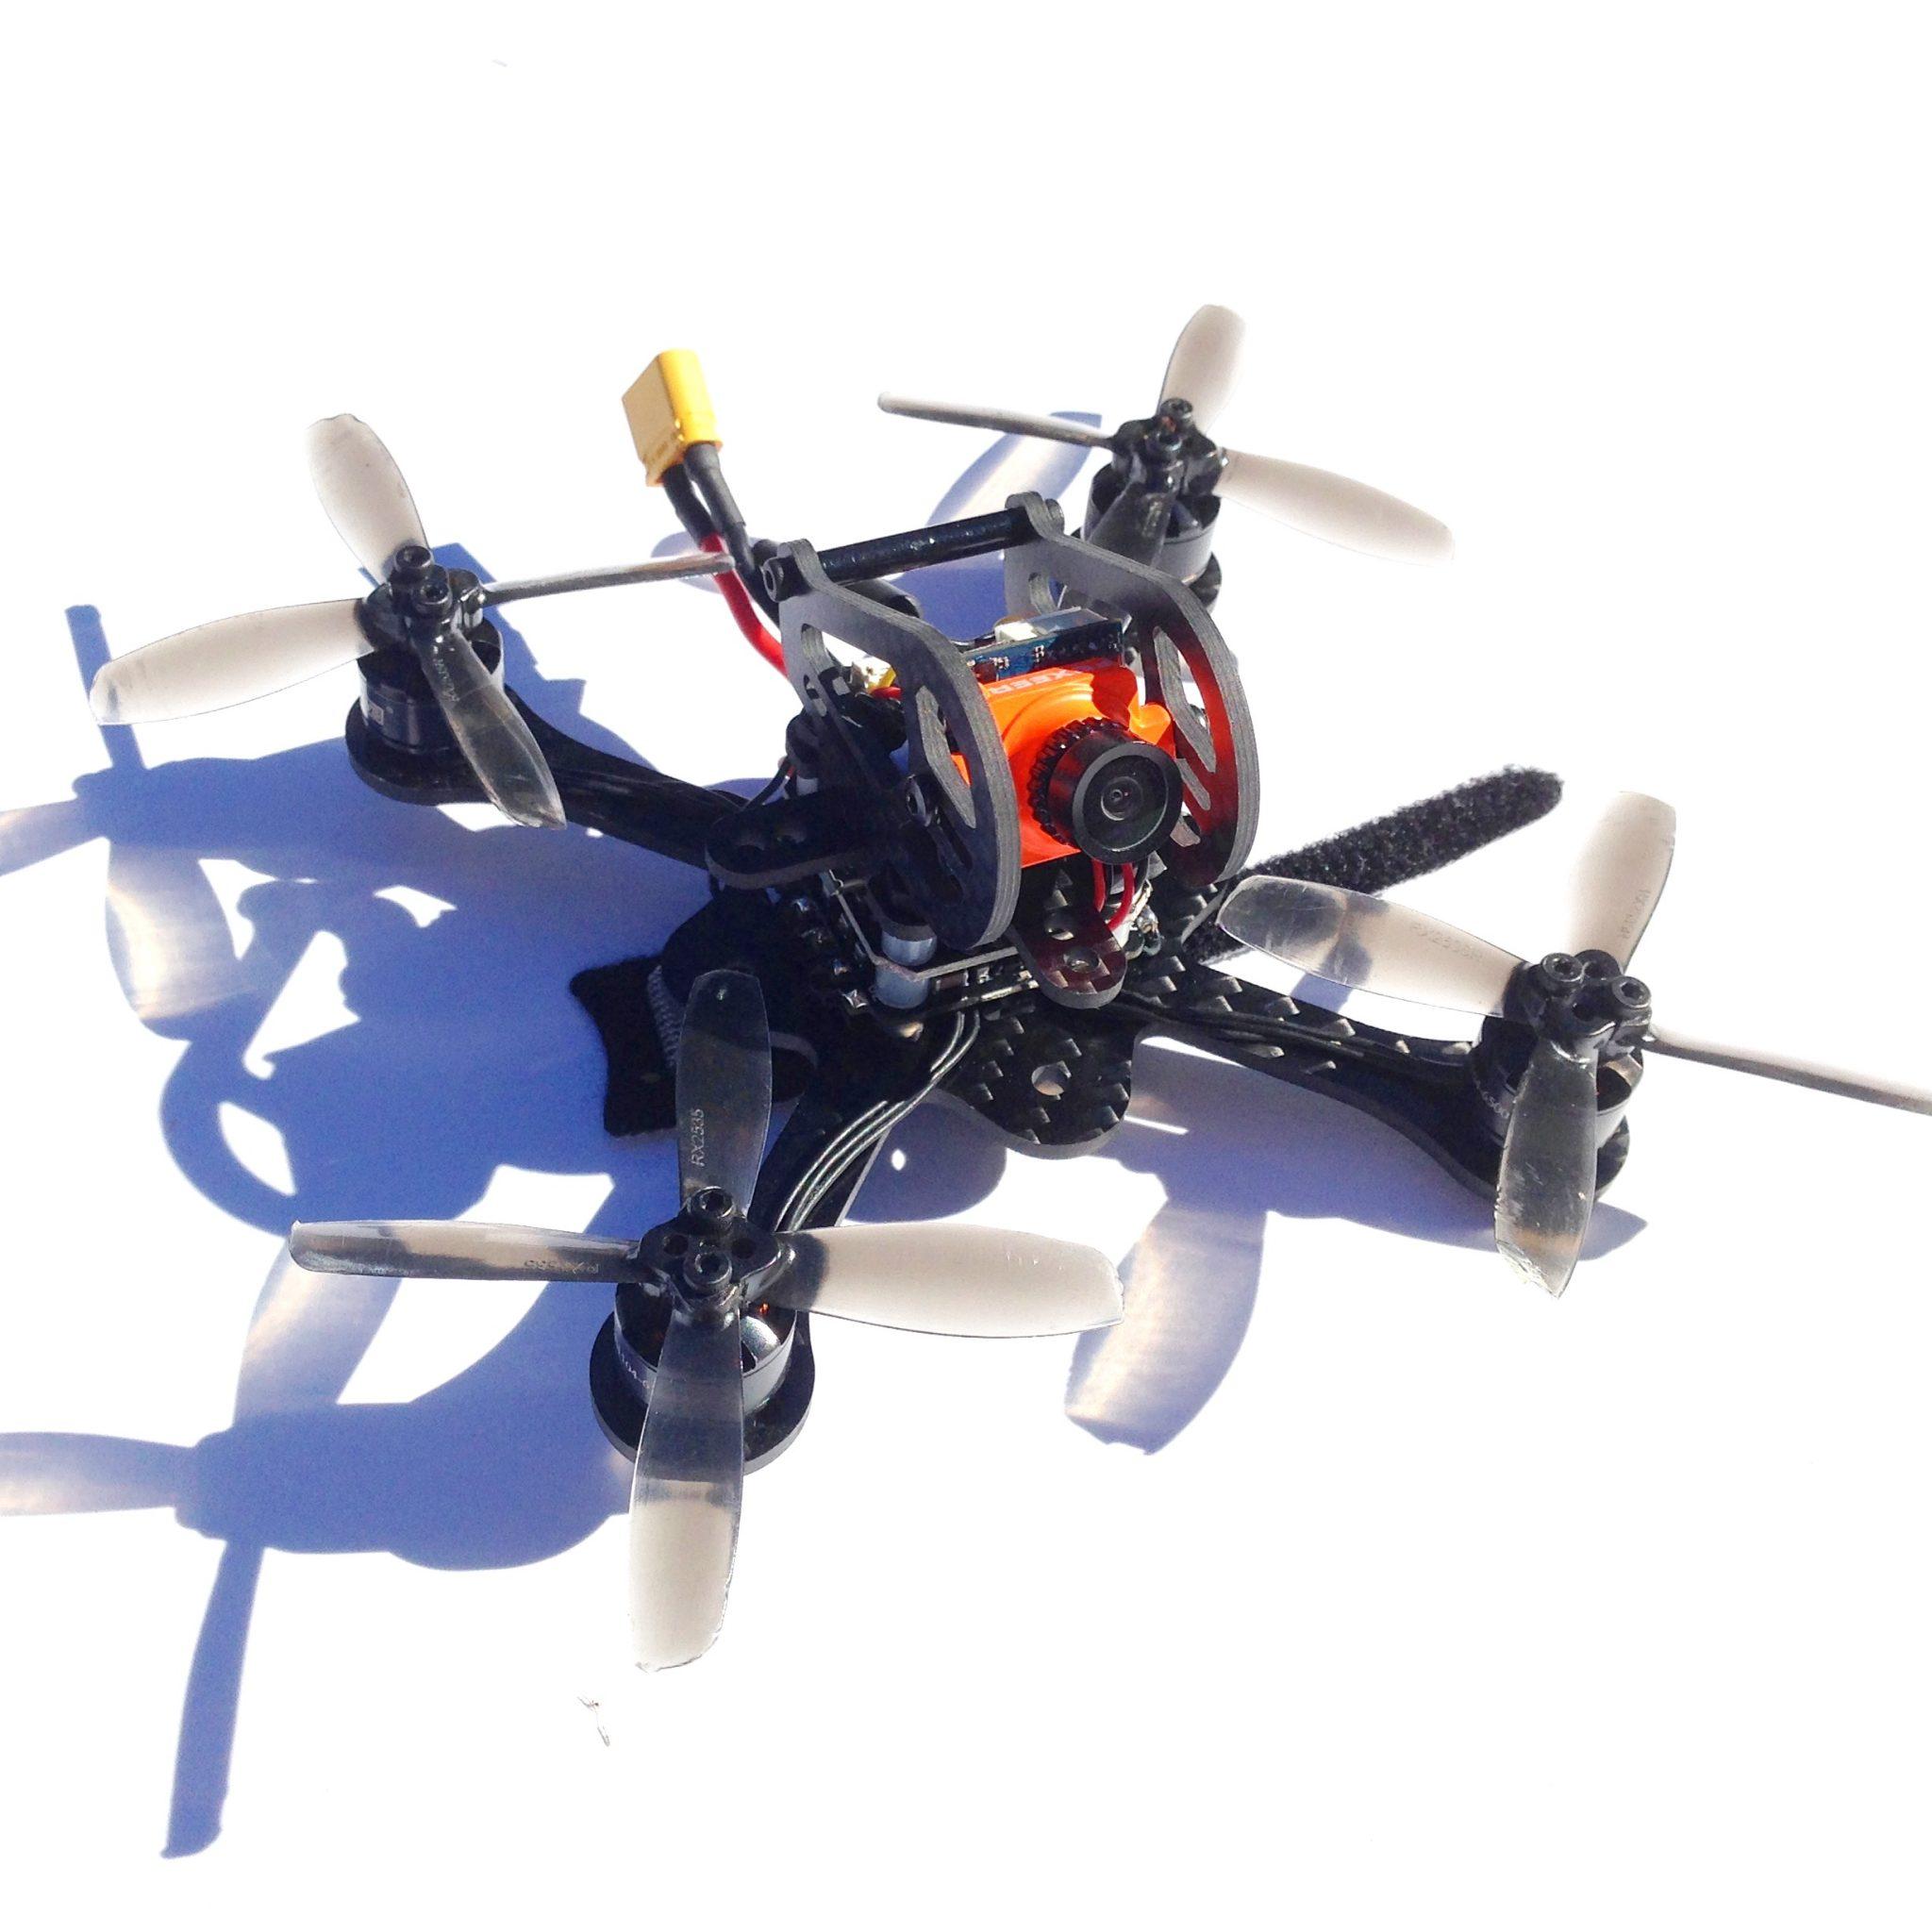 Diy Fpv Racing Drone Kit - Drone HD Wallpaper Regimage Org